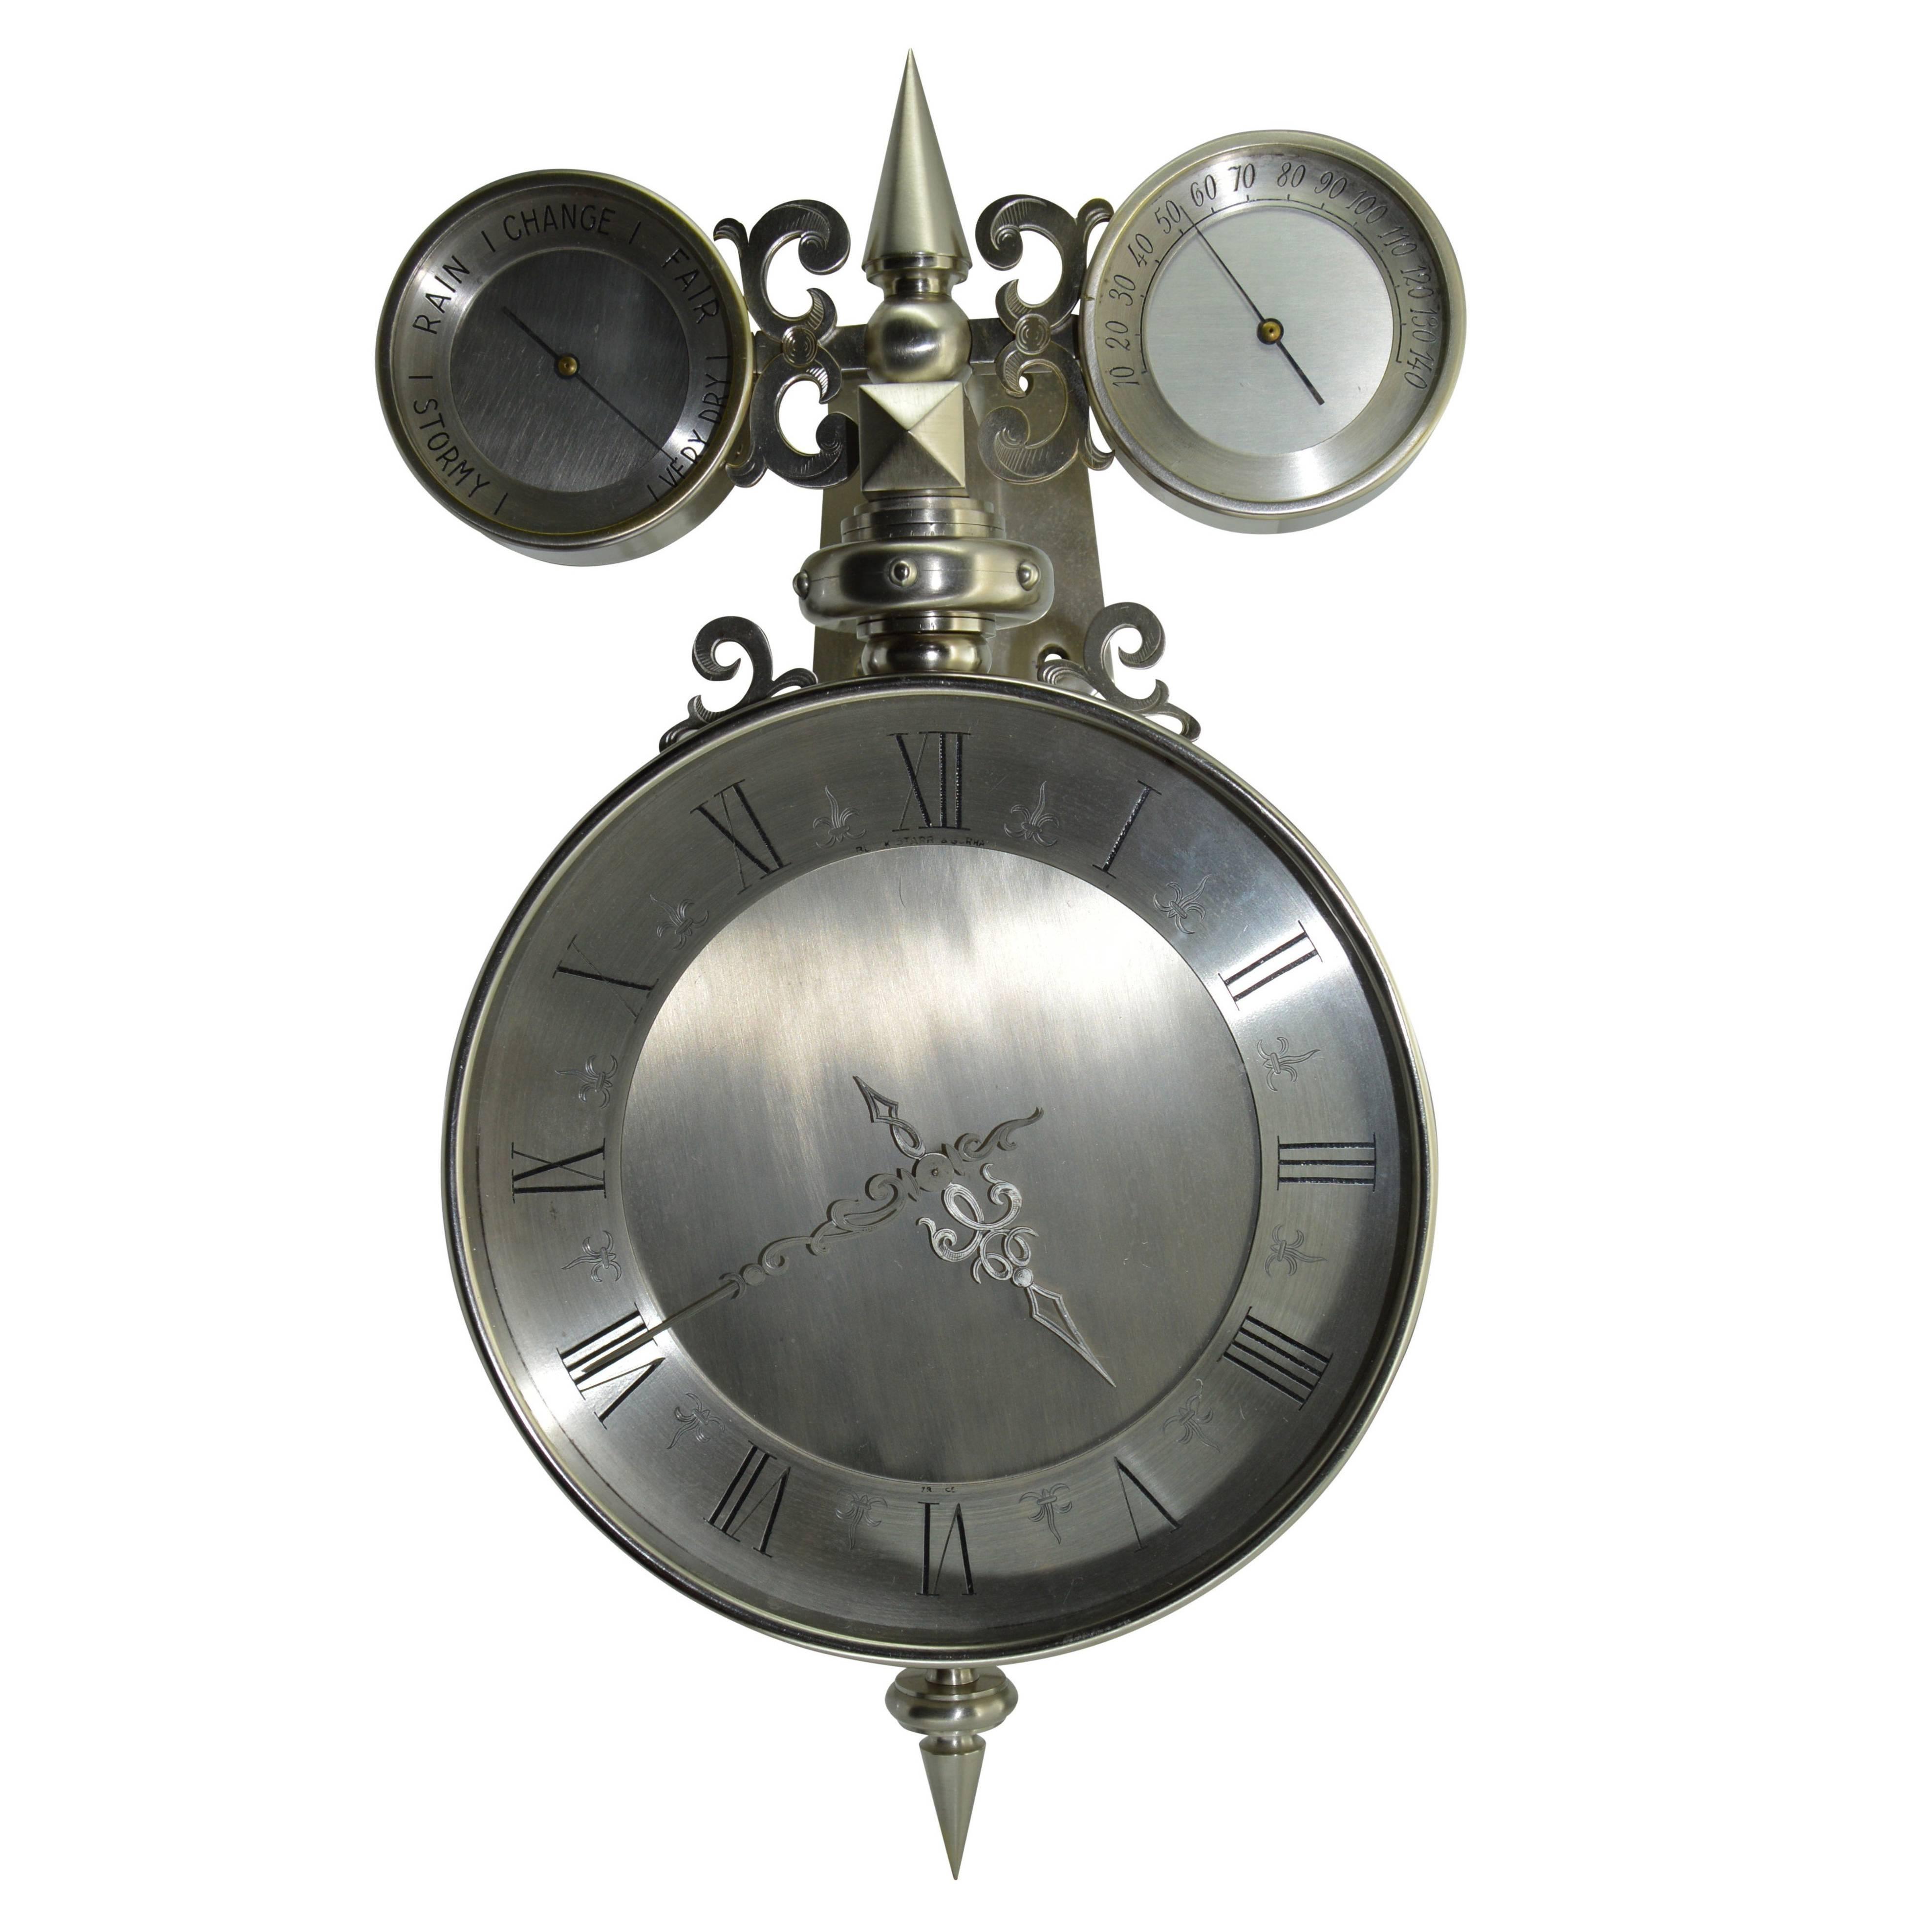 Black Starr & Gorham Gothic Bold Wall Clock in Original Box